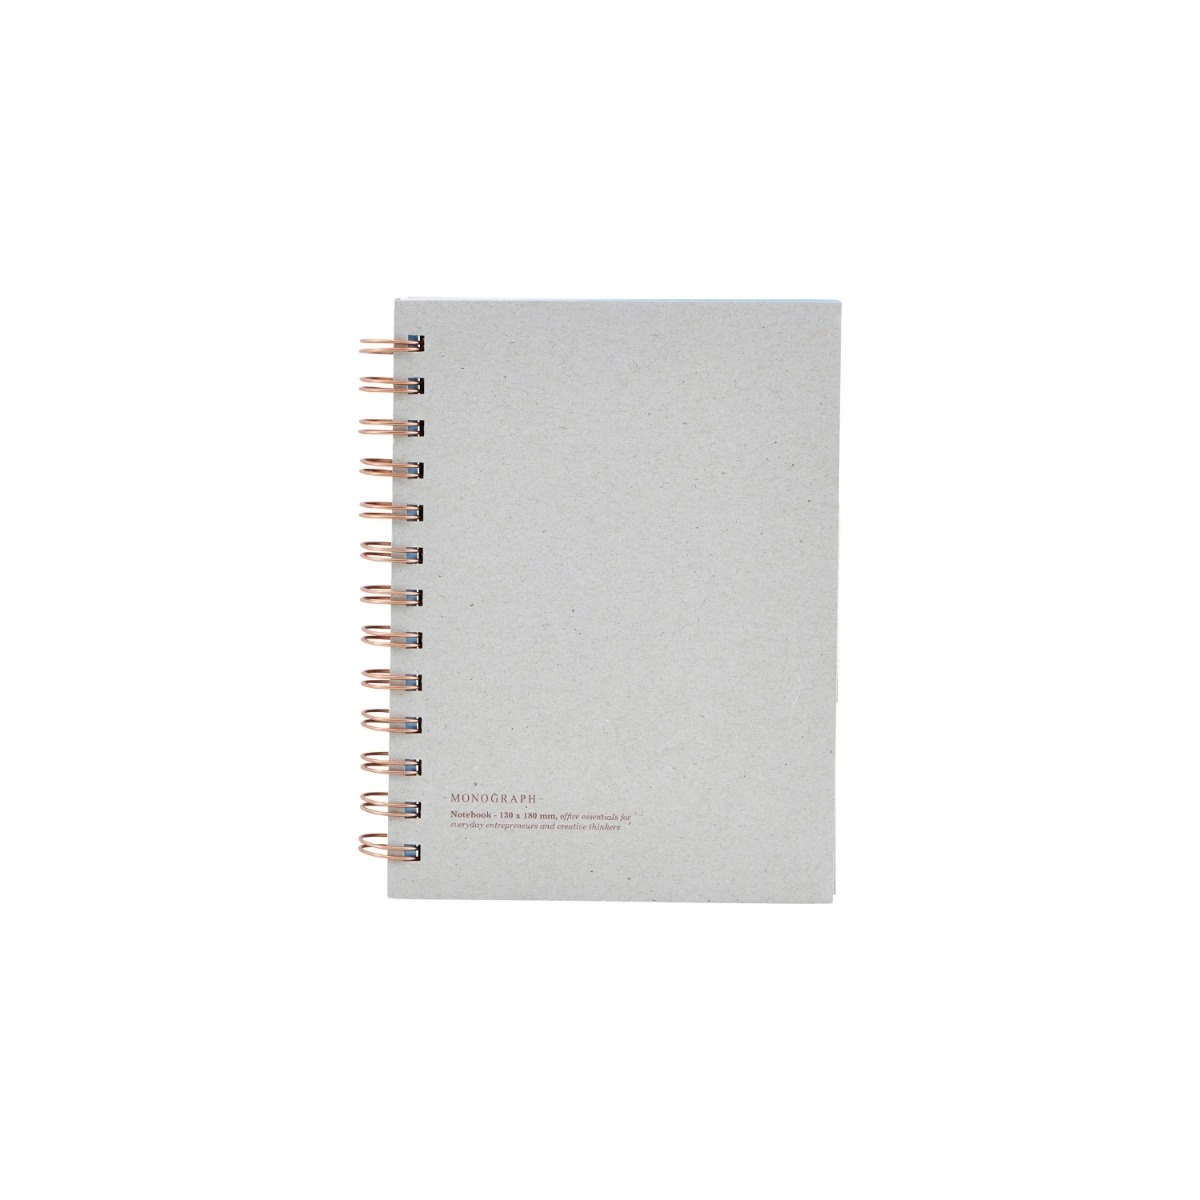 Monograph Anteckningsbok Tome 18x13,5 cm Grå